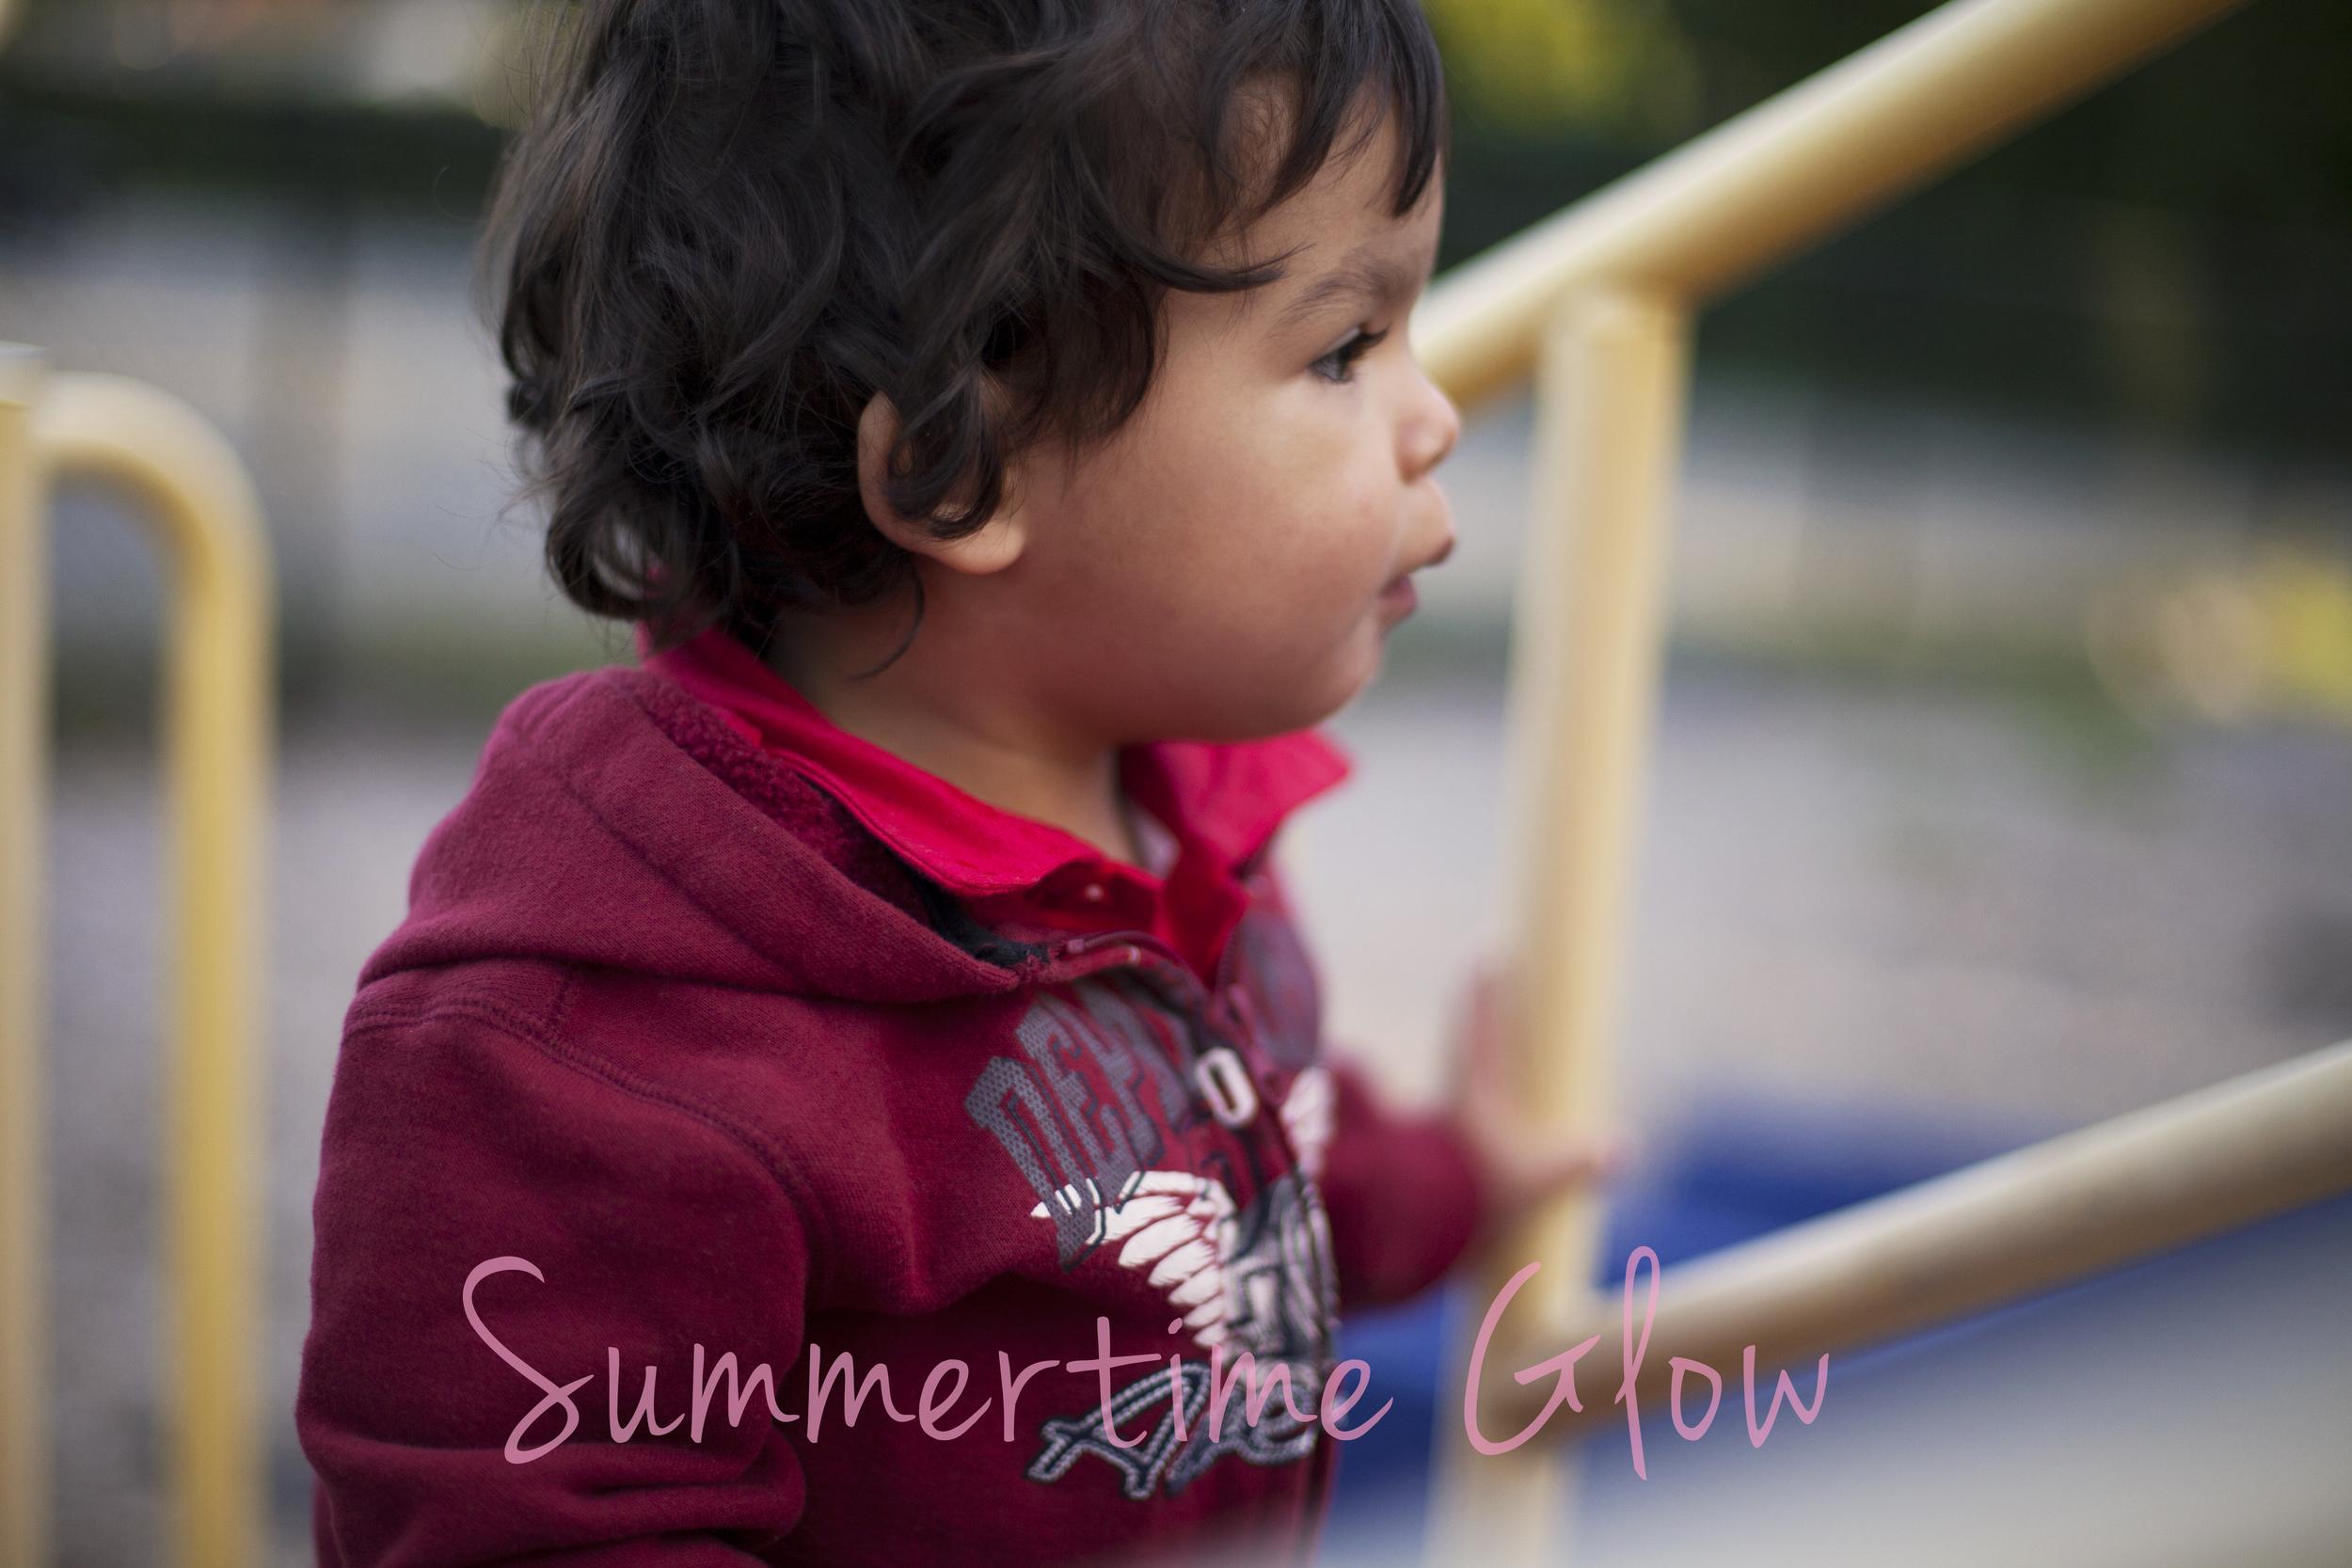 SummertimeglowATN.jpg